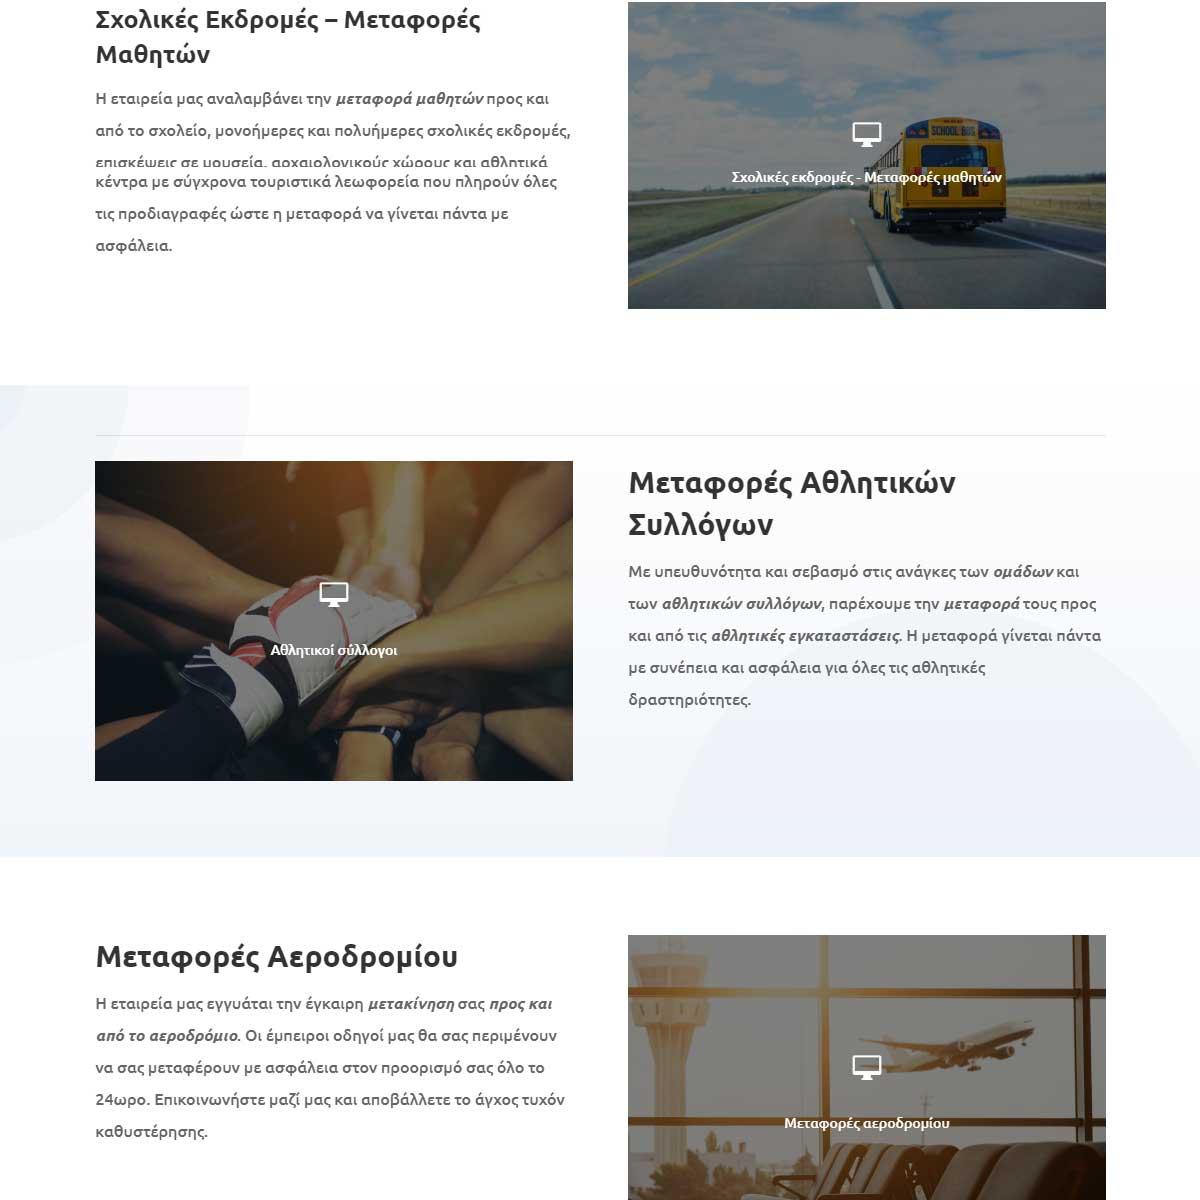 bustravel-scene-kataskevi-istoselidwn-codewild2